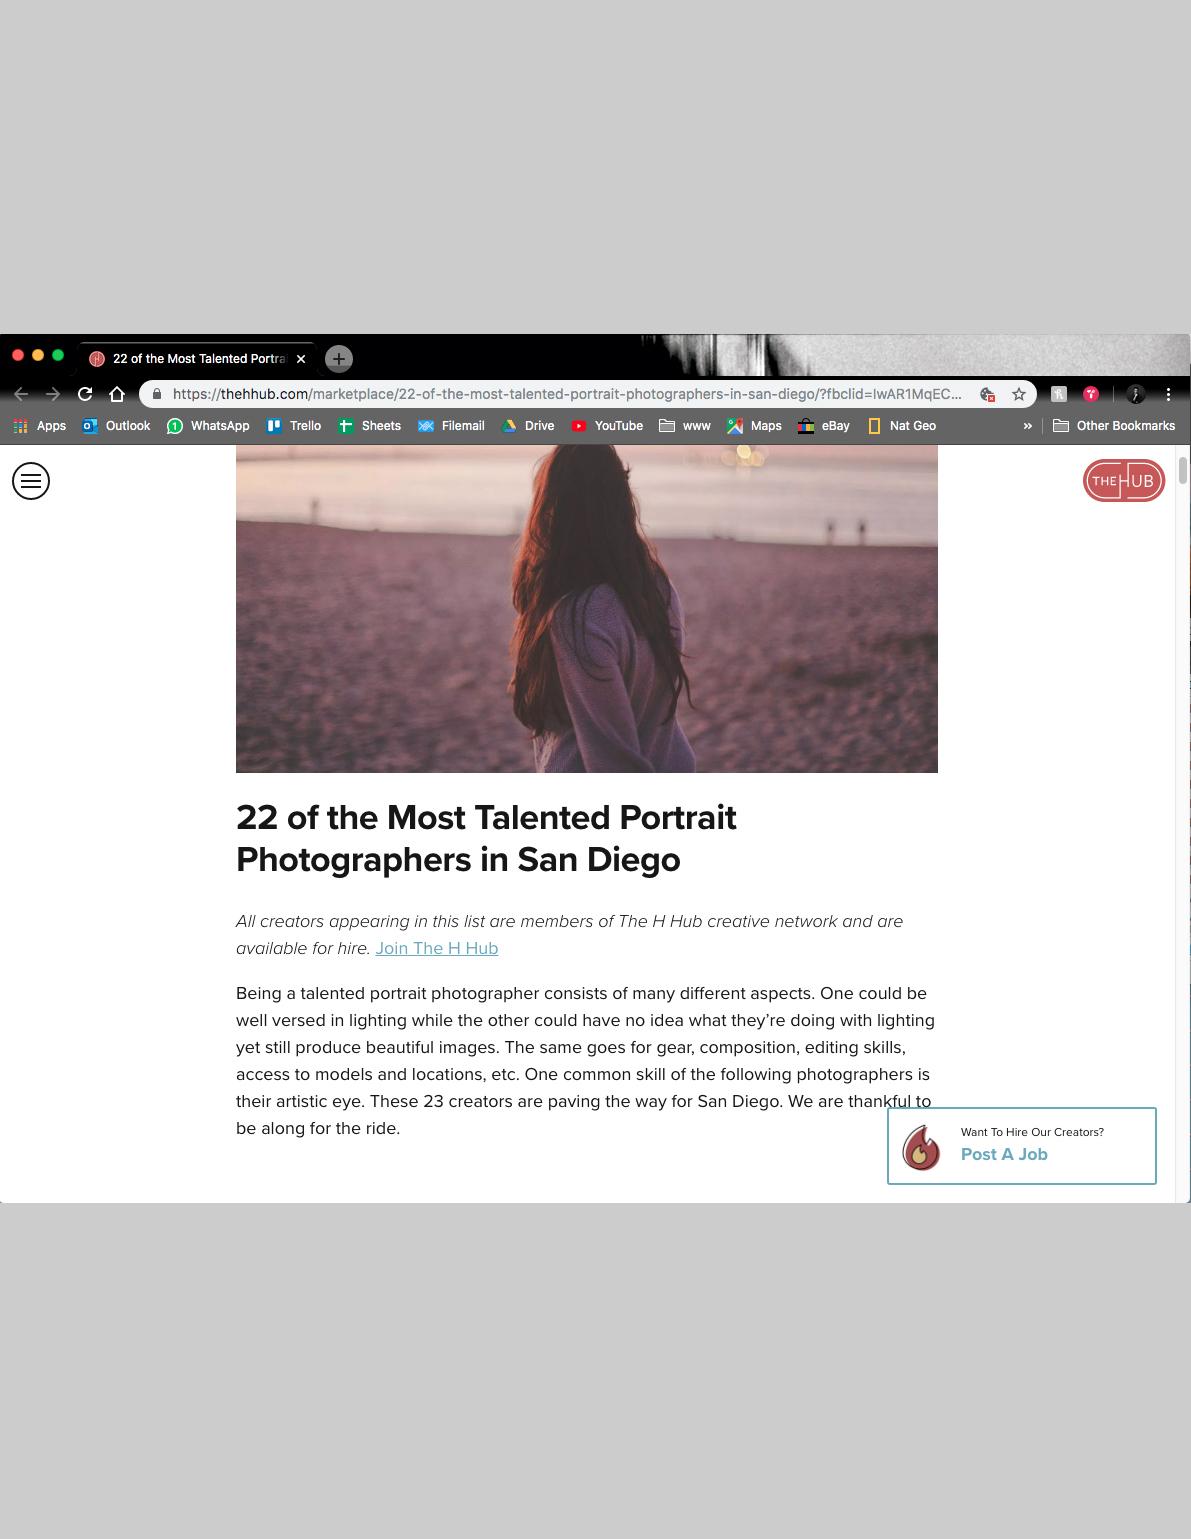 The H Hub - Top 22 Most Talented Photogrpahers SD - Desktop1.jpg